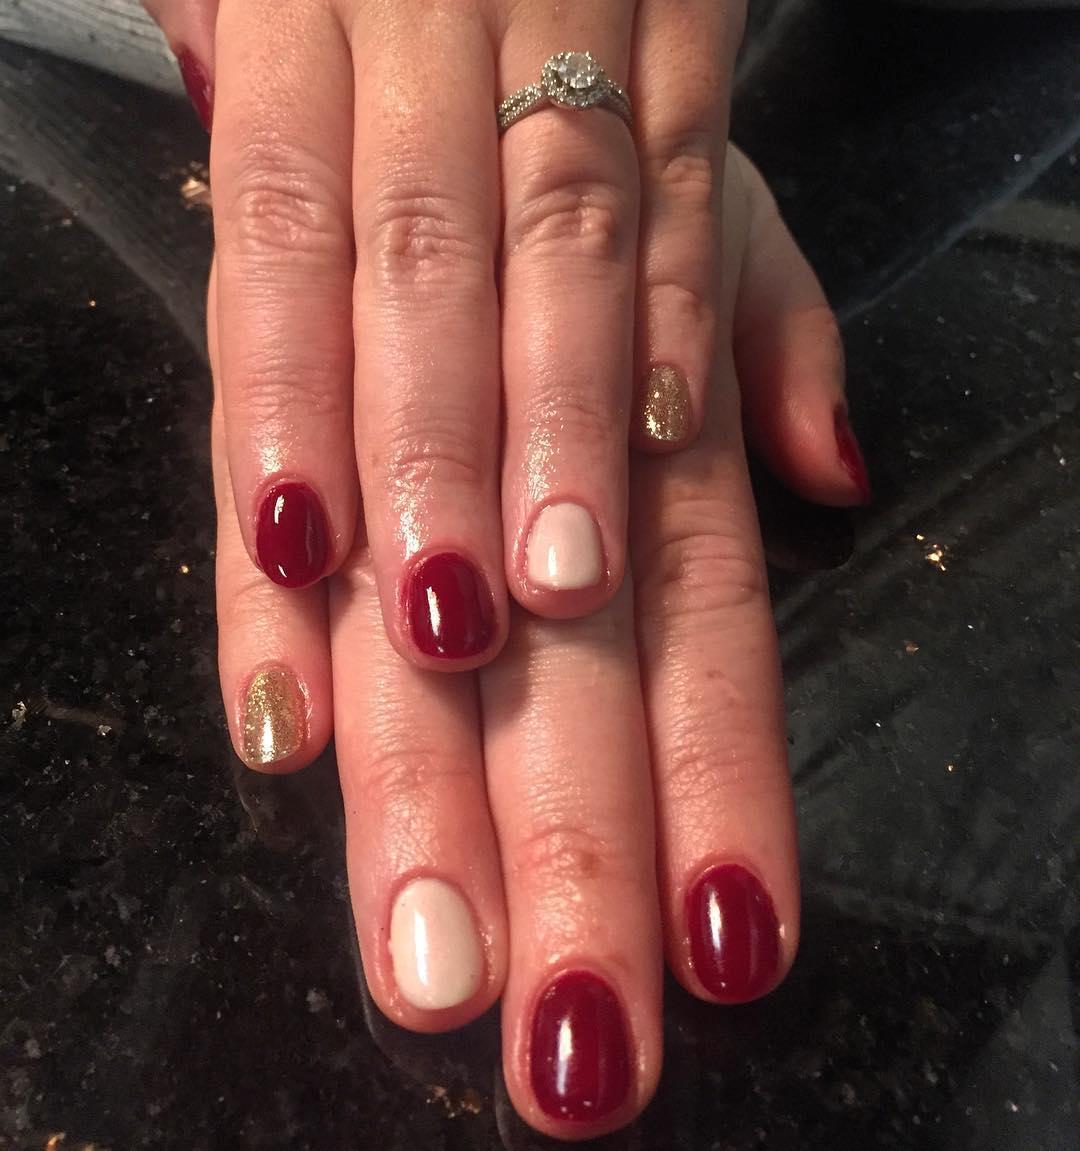 smashing glitter nail polish designs and ideas 2019 9 - Smashing Glitter Nail Polish Designs and Ideas 2019